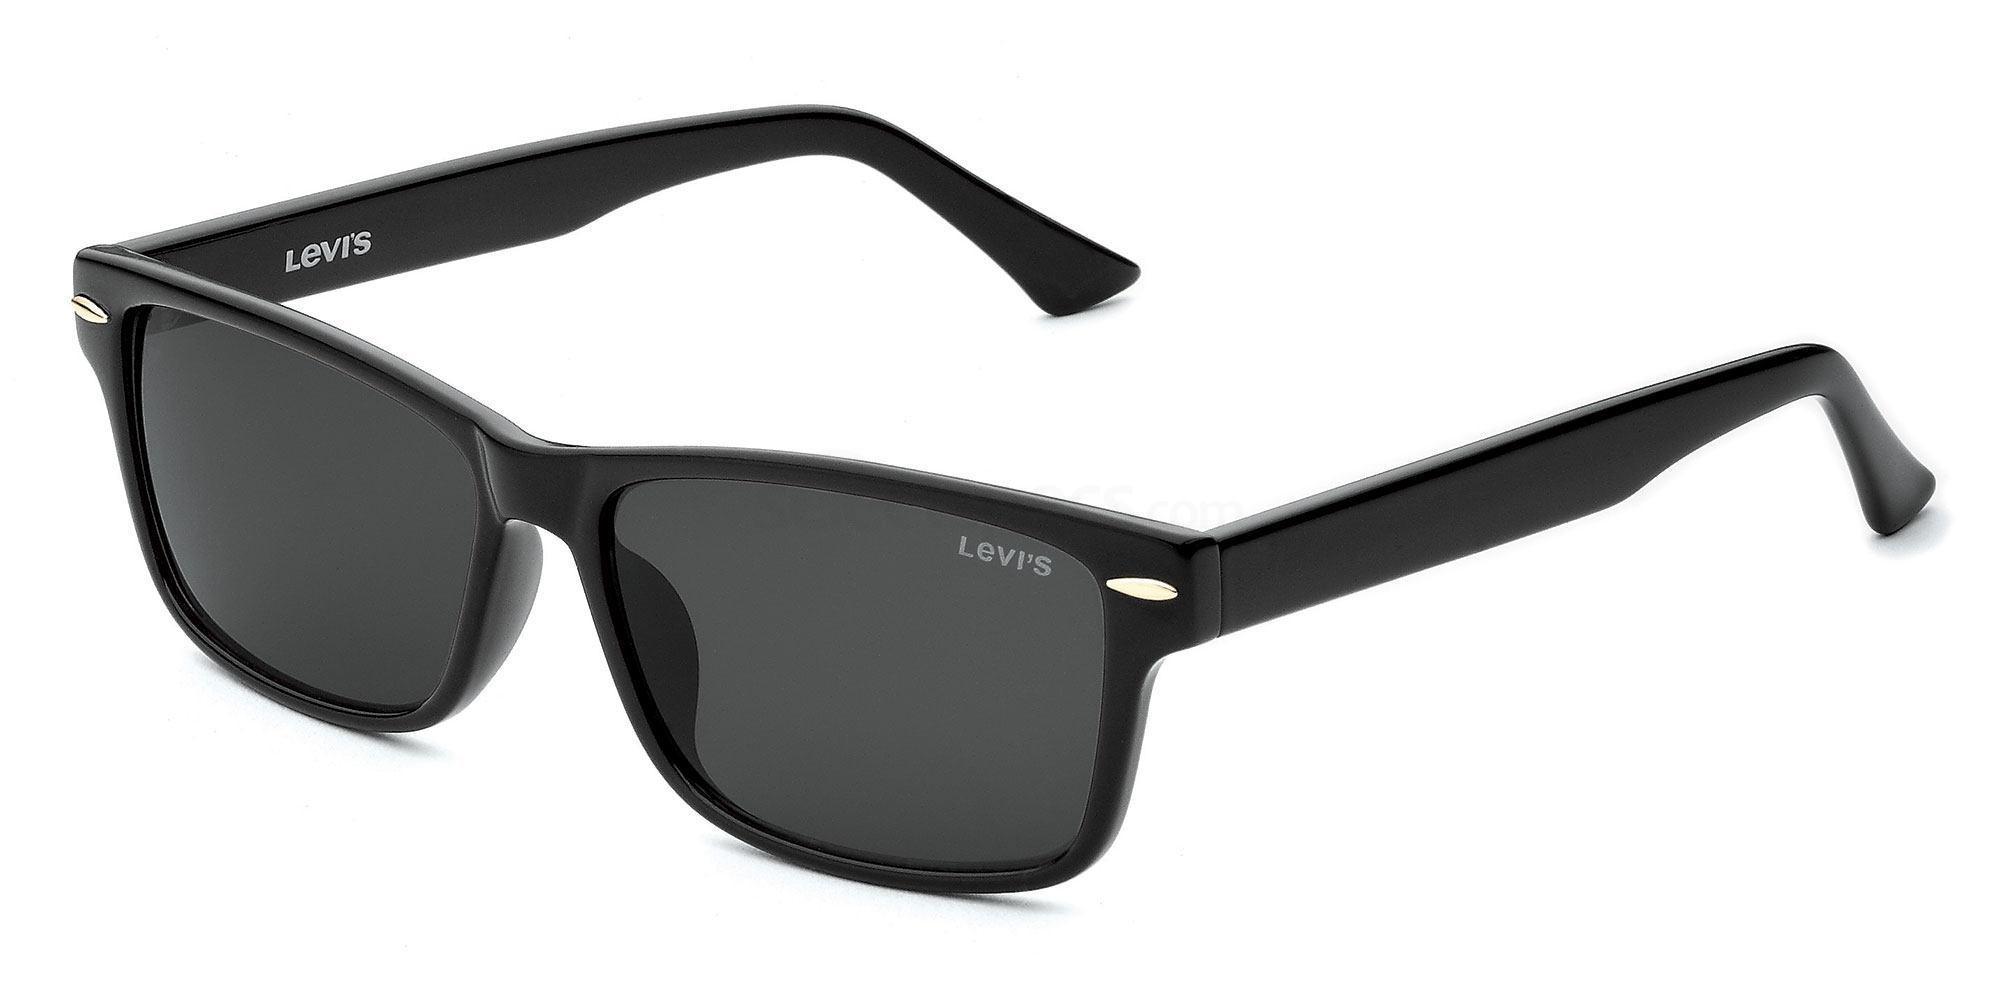 LO22382/01 LO22382 Sunglasses, Levi's Eyewear